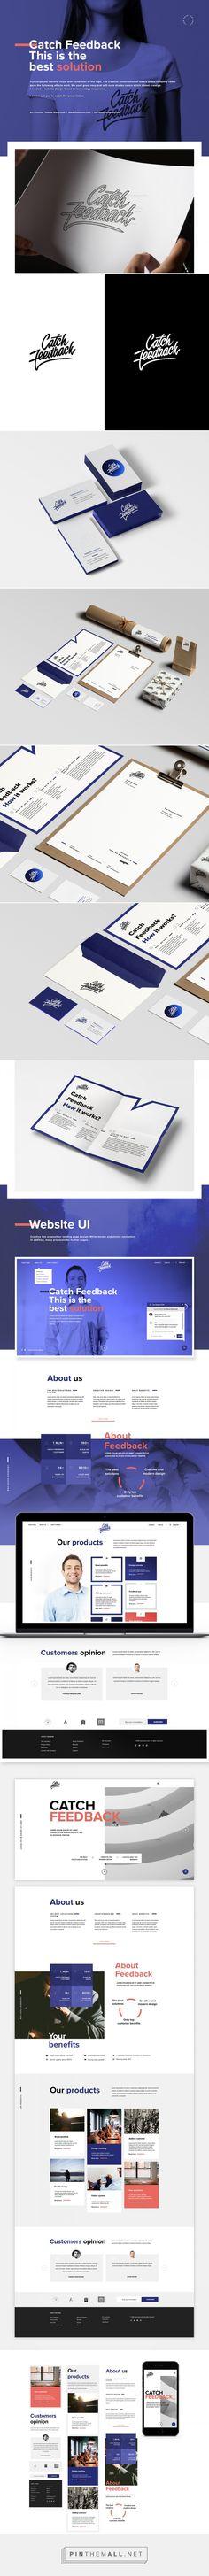 Catch Feedback - Branding and Website on Behance - created via https://pinthemall.net